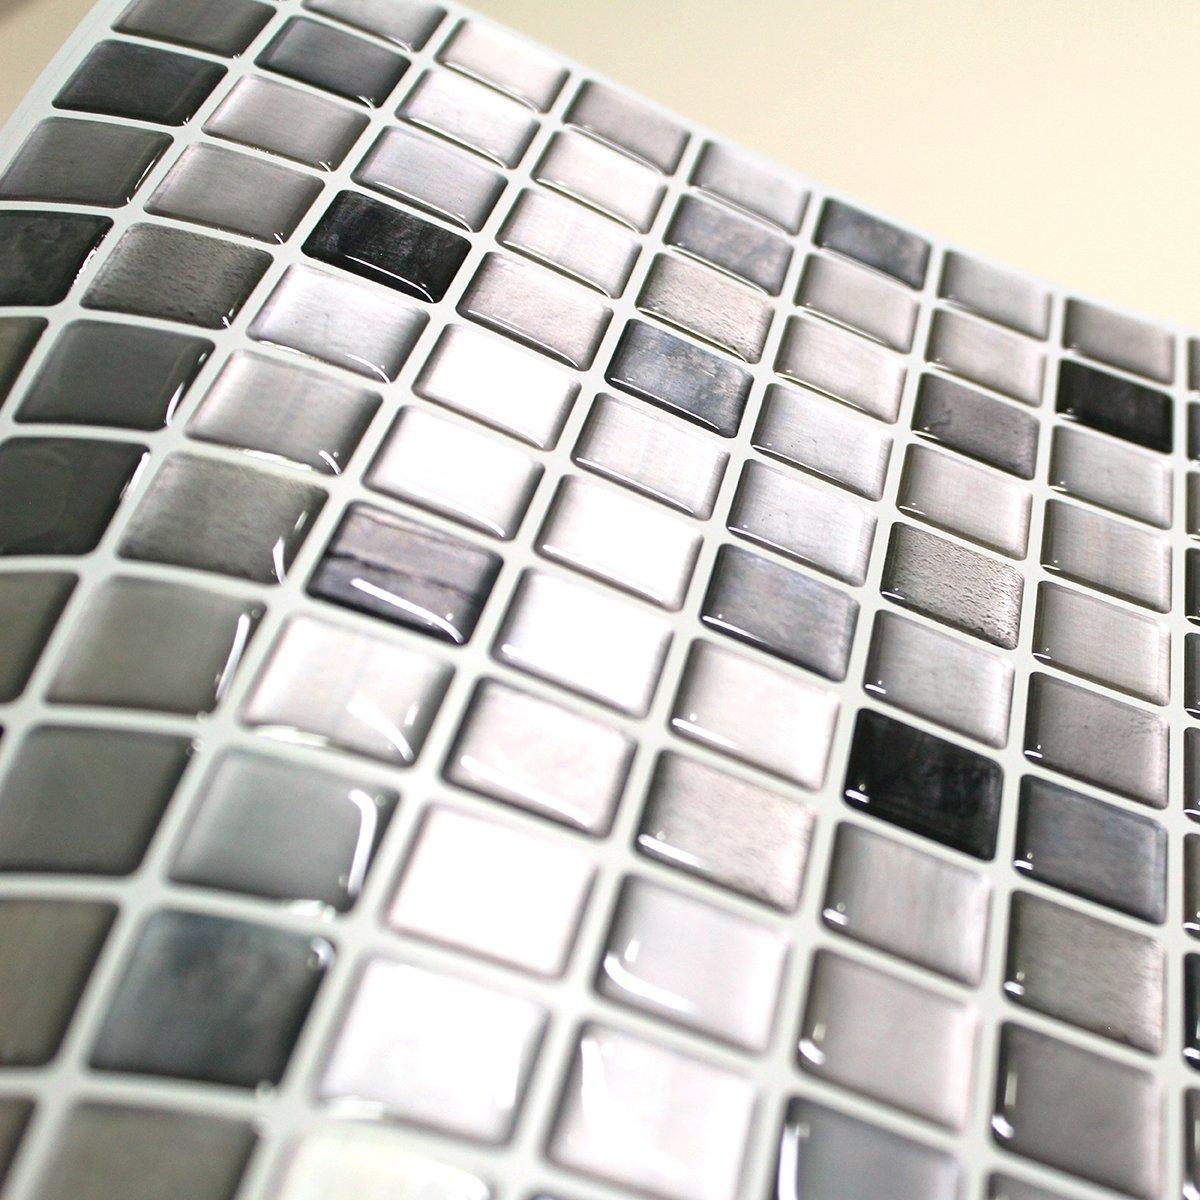 BEAUSTILE Decorative Tile Stickers Peel Stick Backsplash Fire Retardant Tile Sheet (Monocrome) (10, 12.2'' x 12.2'') by BEAUS TILE (Image #3)